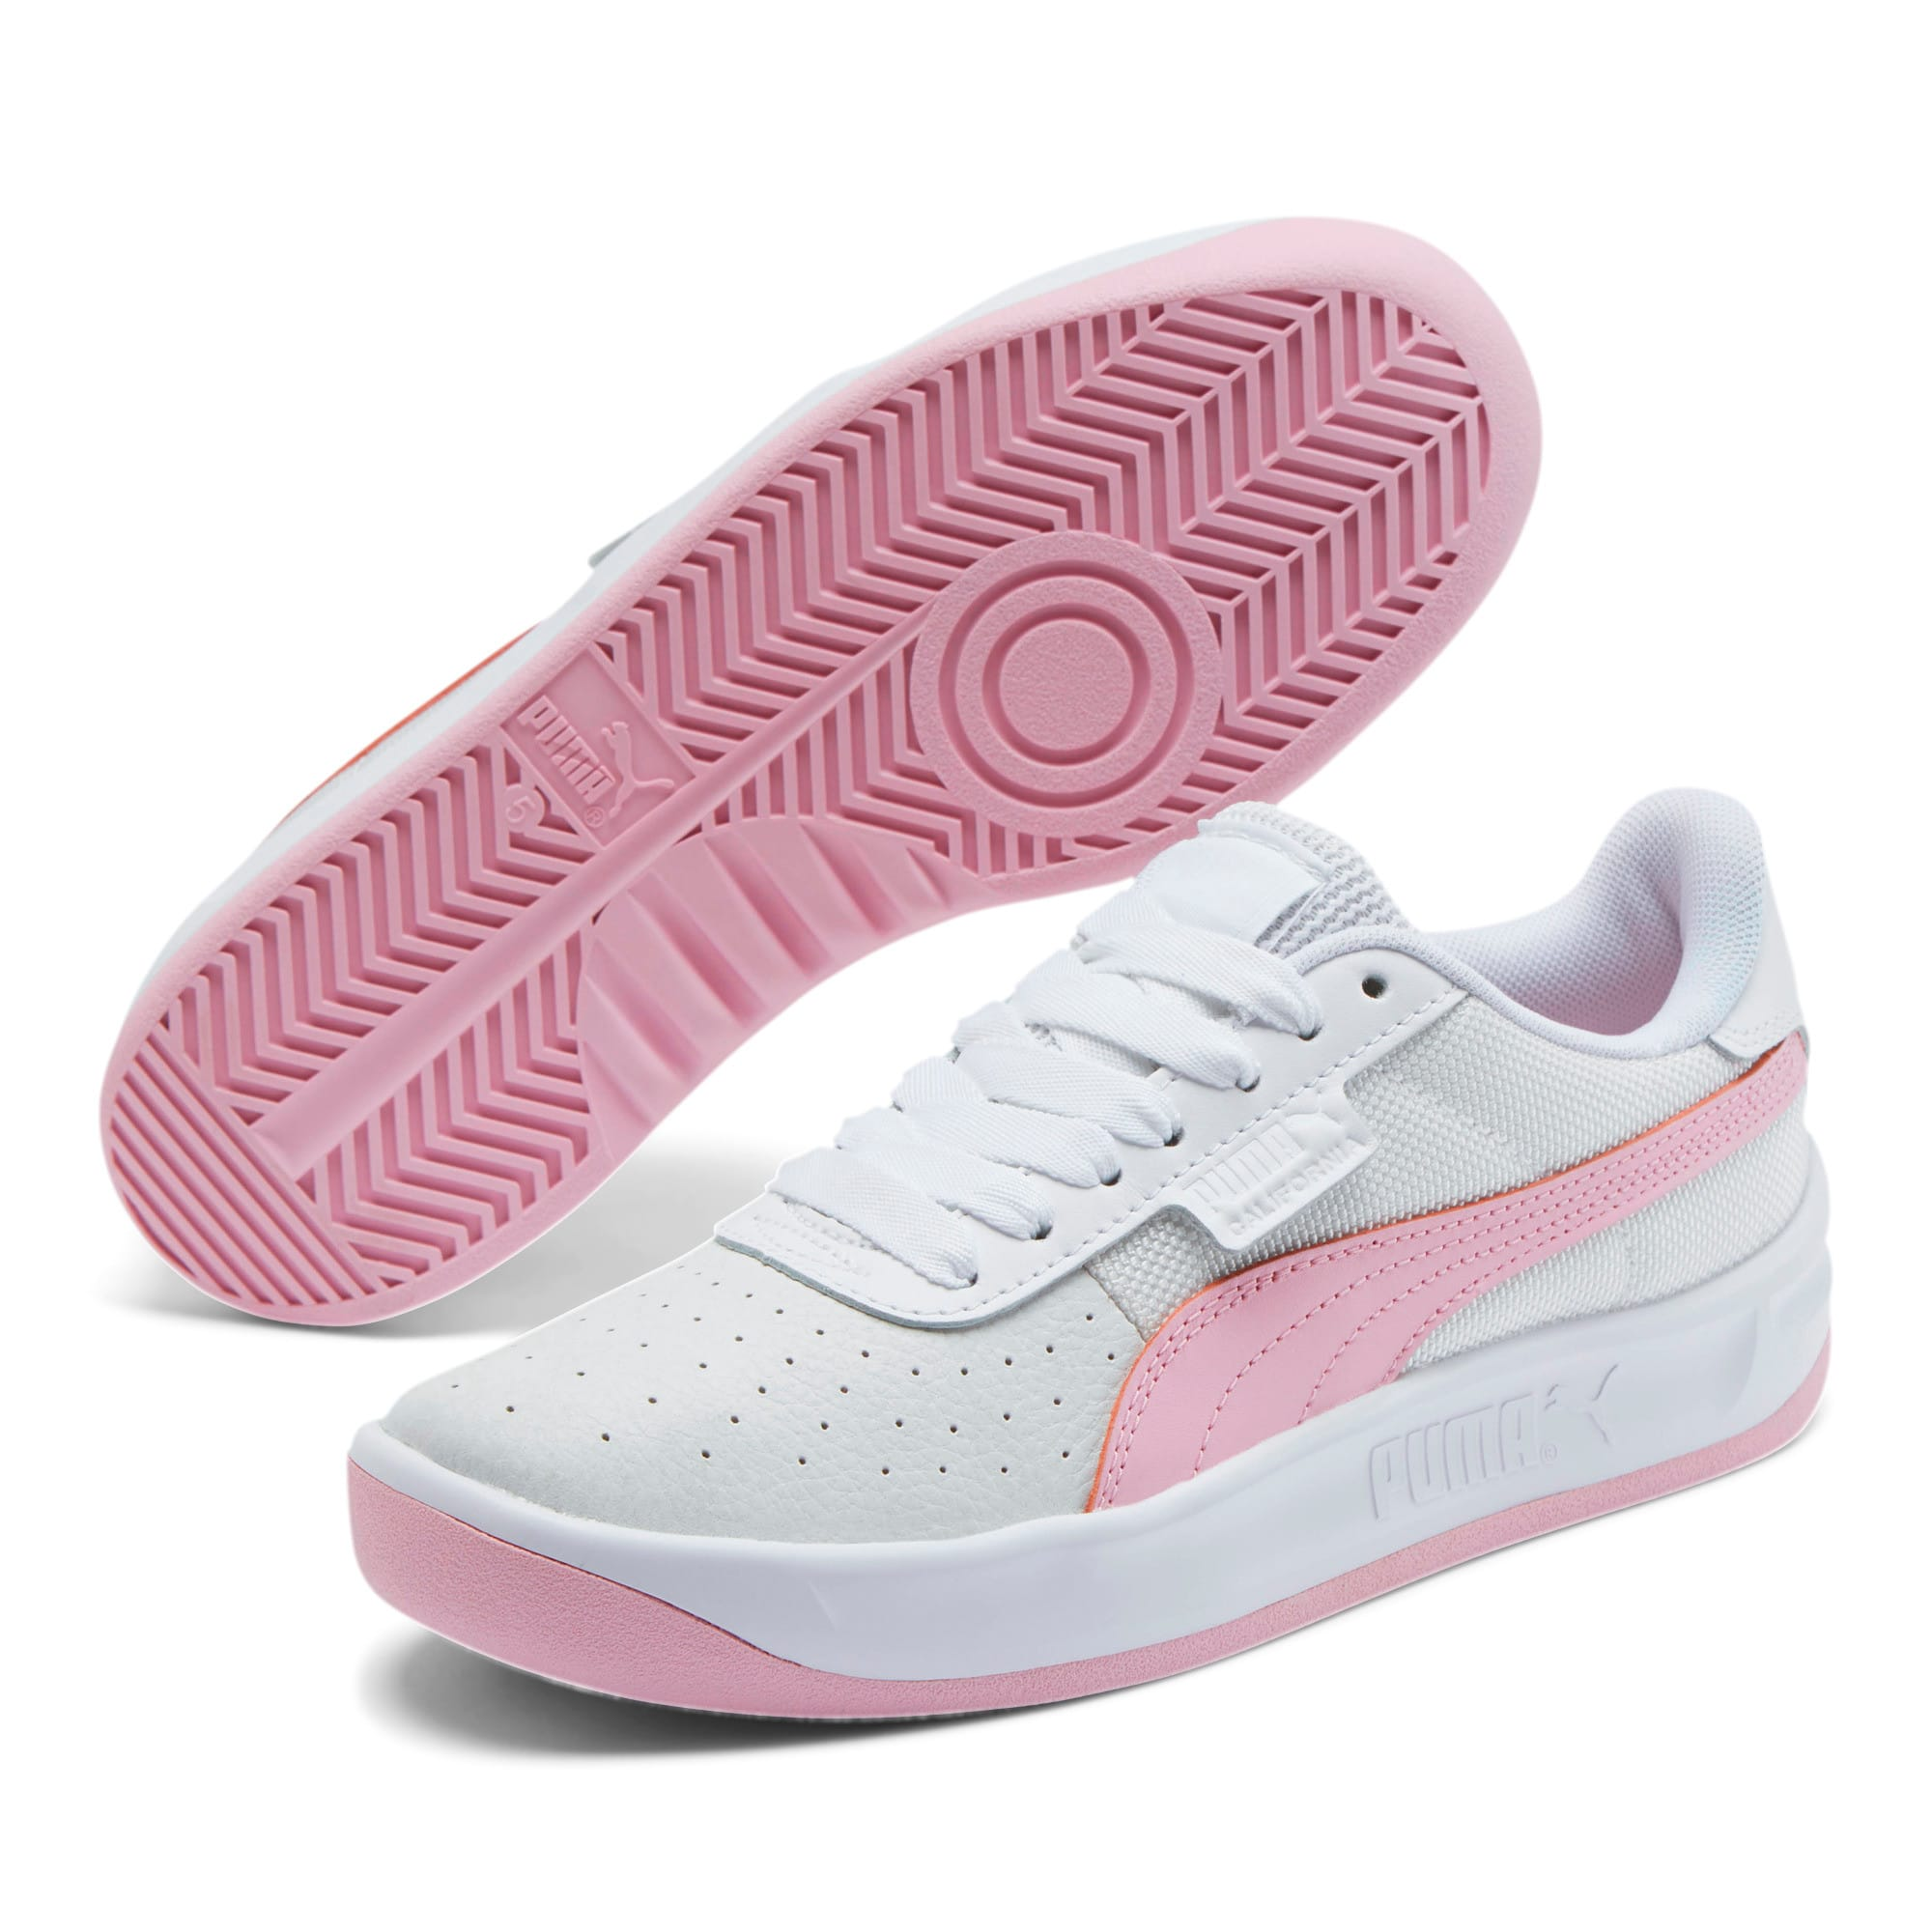 Thumbnail 2 of California Women's Sneakers, Puma Wht-Pale Pink-Puma Wht, medium